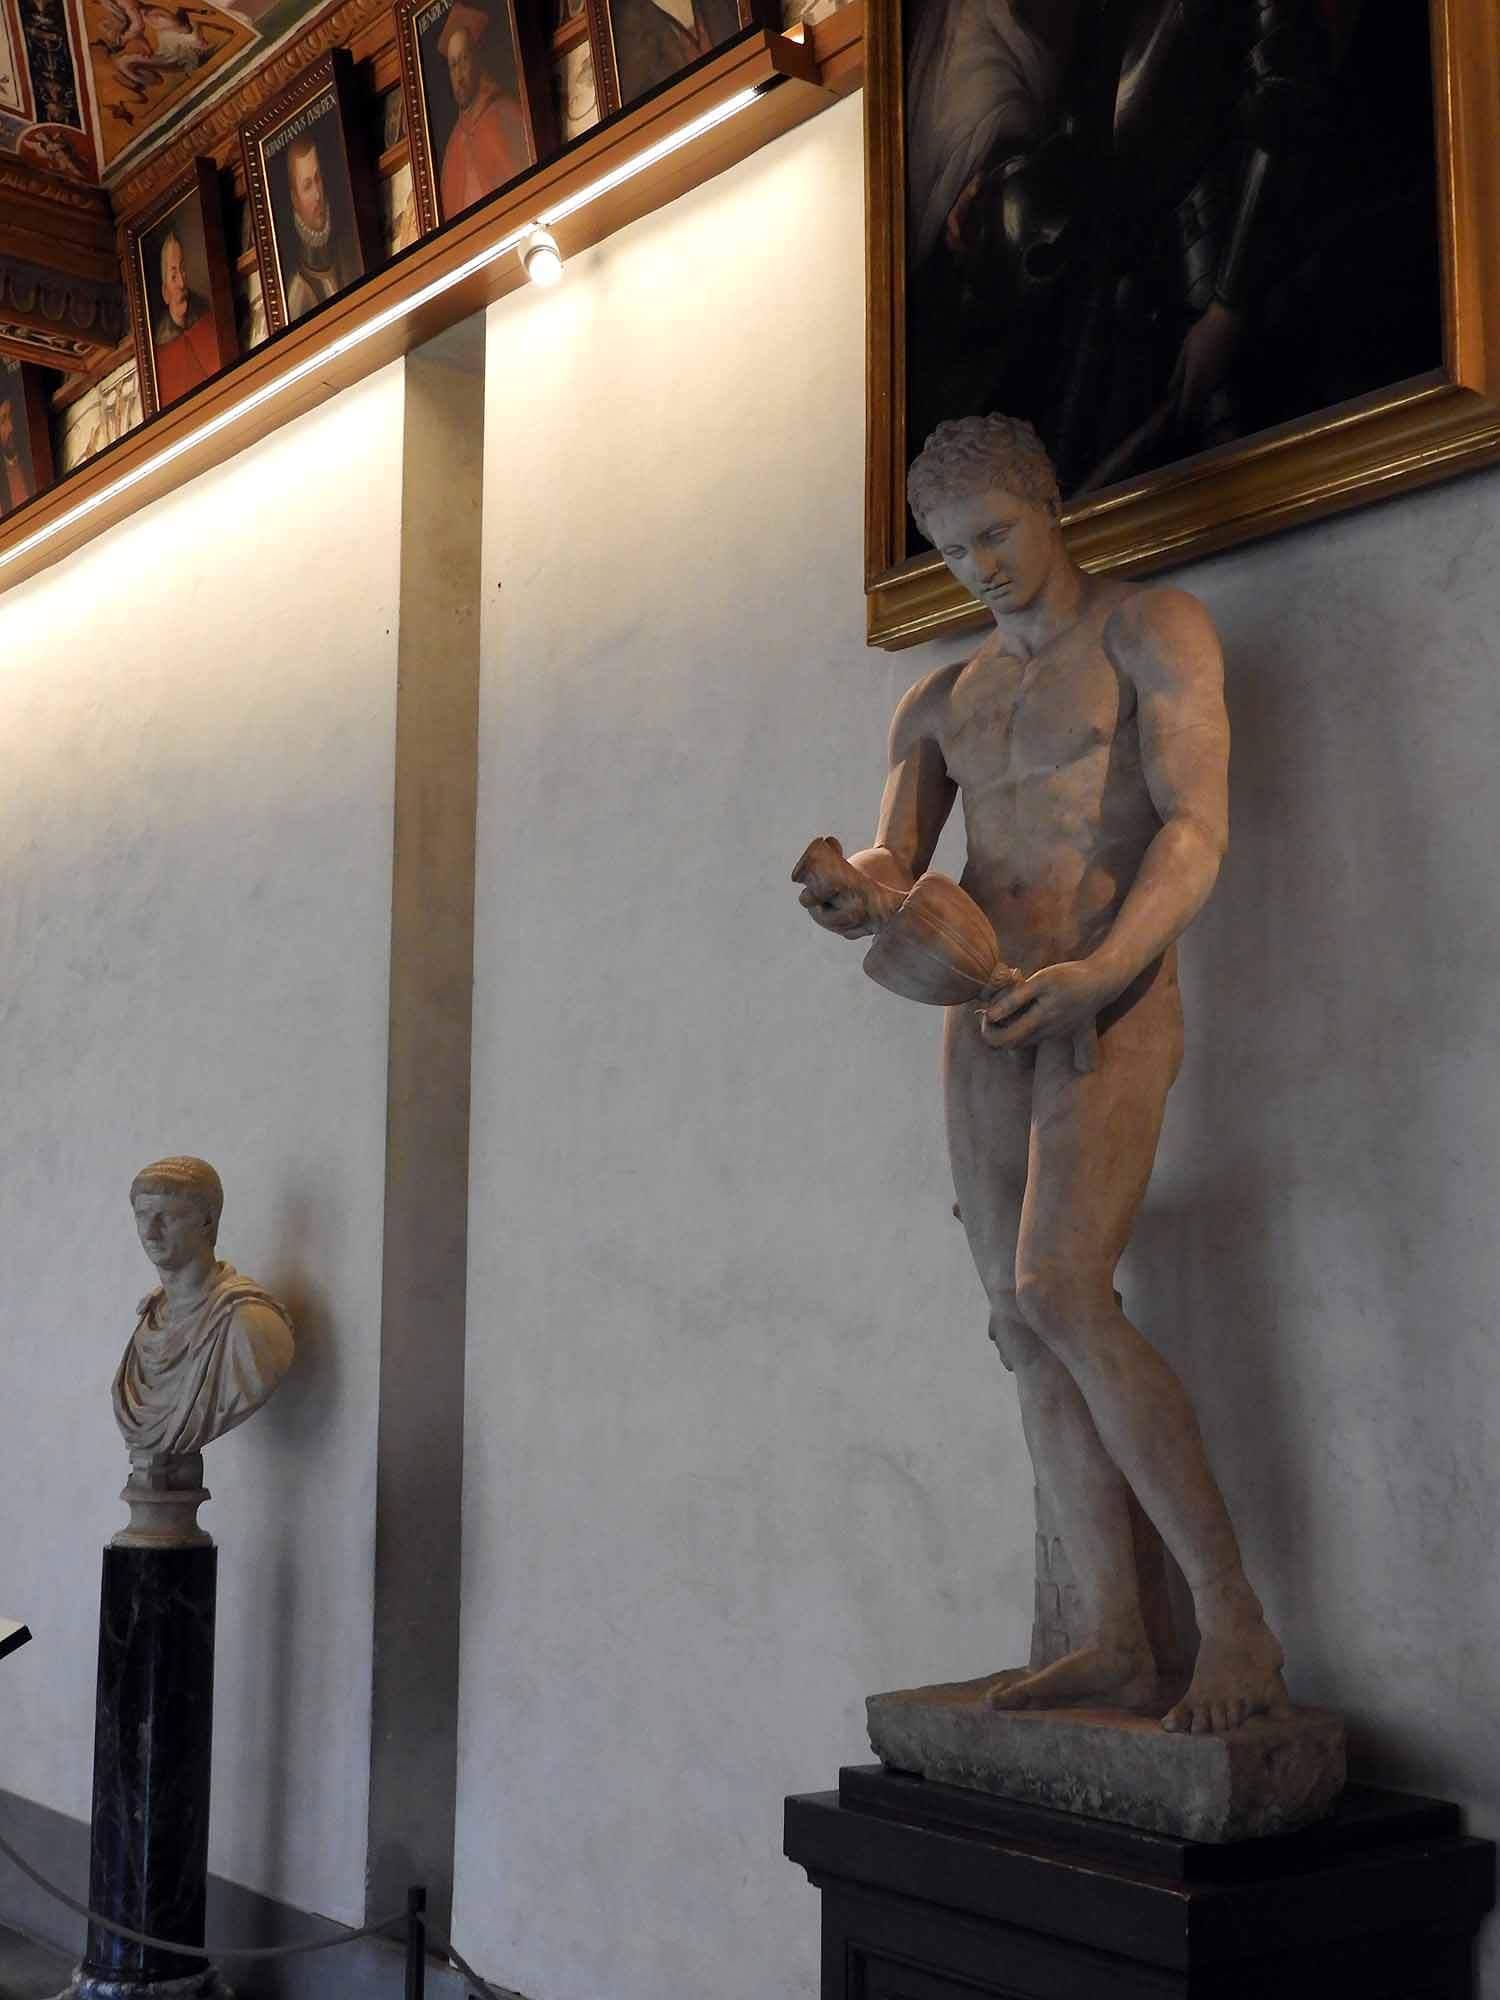 italy-italia-florence-uffizi-museum-hallway-statue-marble.JPG